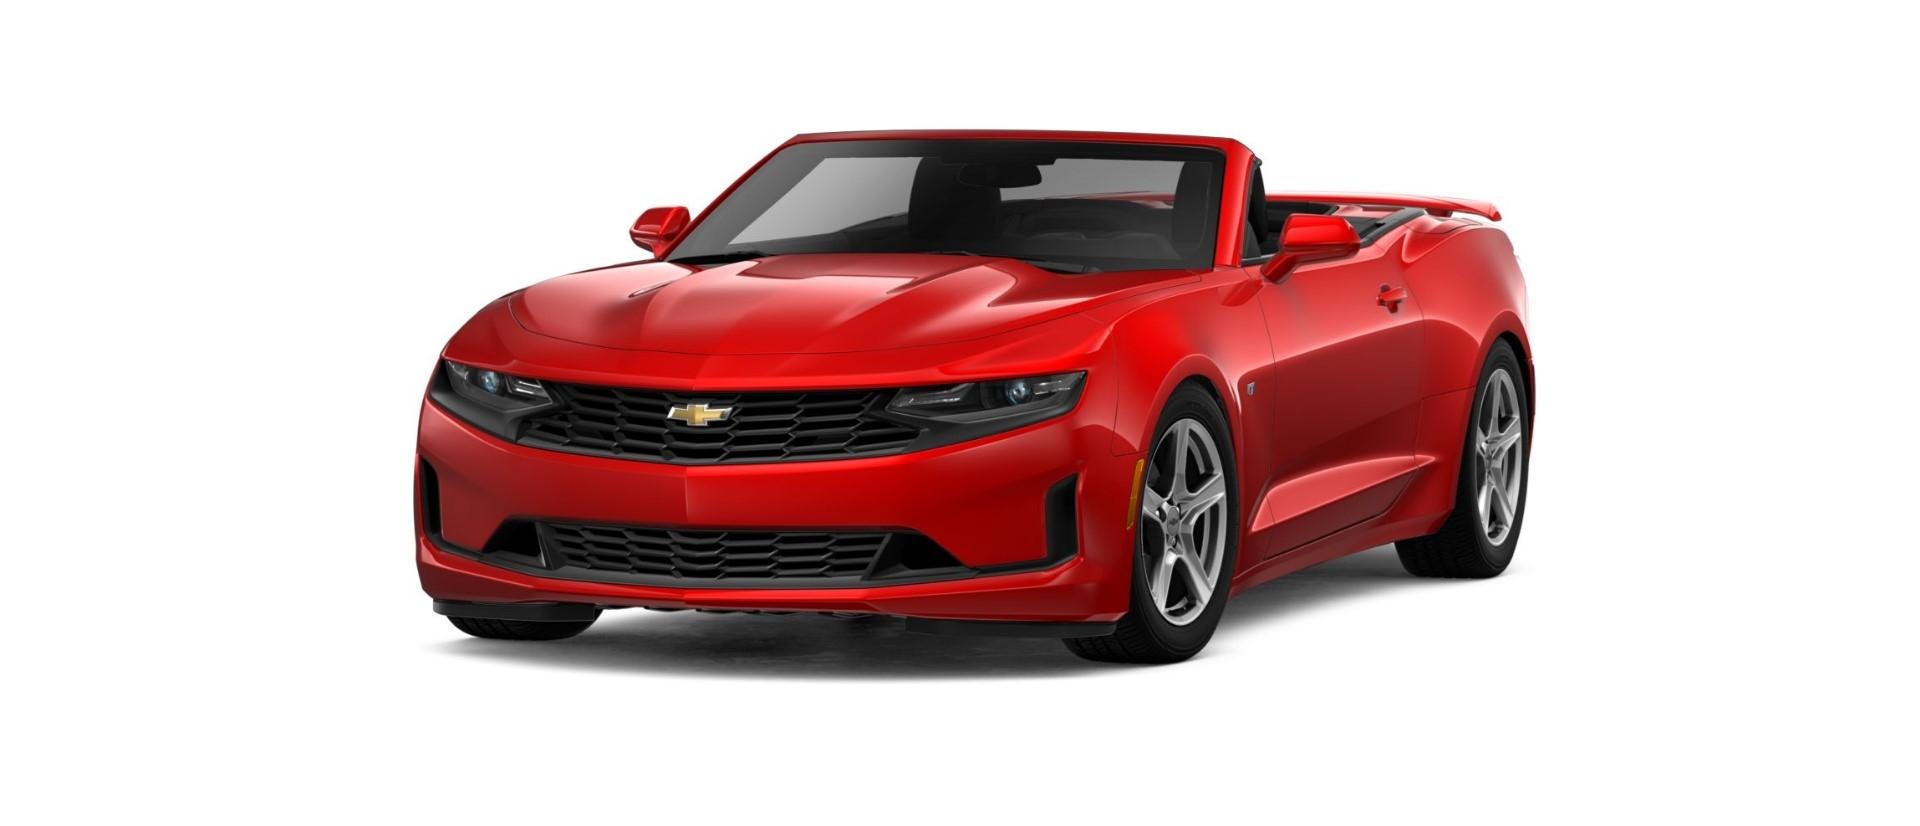 2020 Chevrolet Camaro Convertible LT1 Full Specs, Features ...